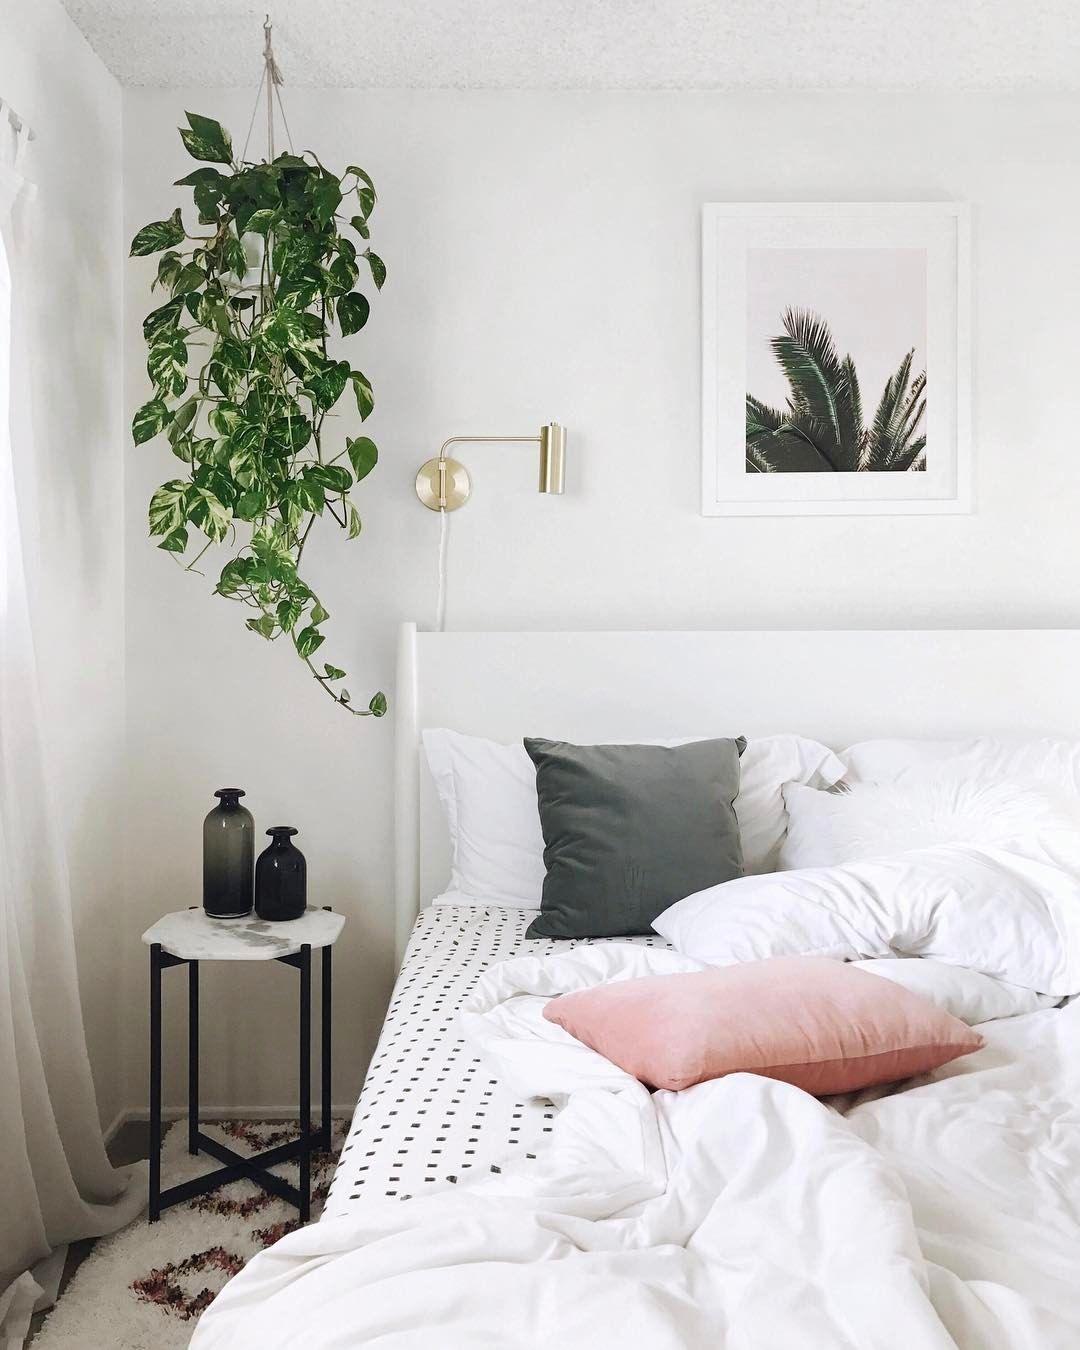 Planta colgante para dar calidez a un dormitorio for Mesillas de habitacion